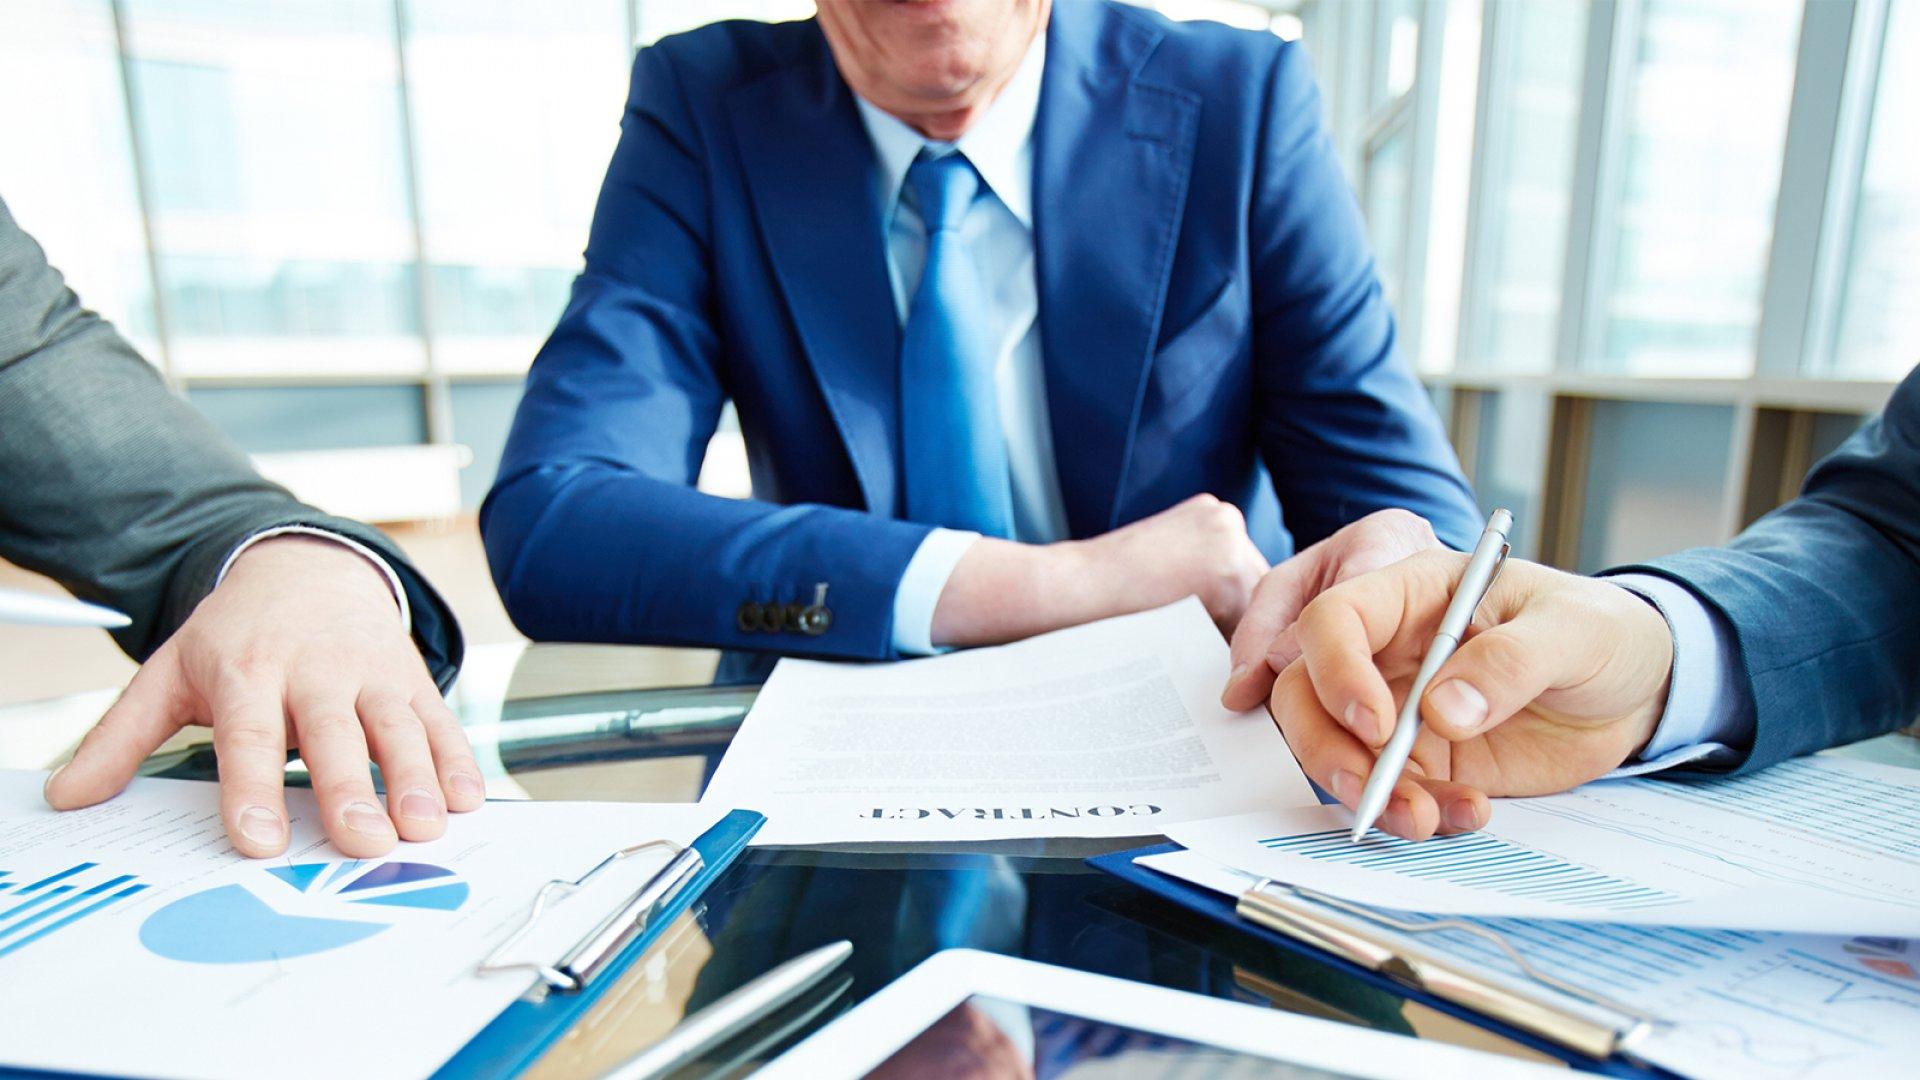 Ketahui 3 Tipe & Jenis Investor Saat Investasi | Money Plus